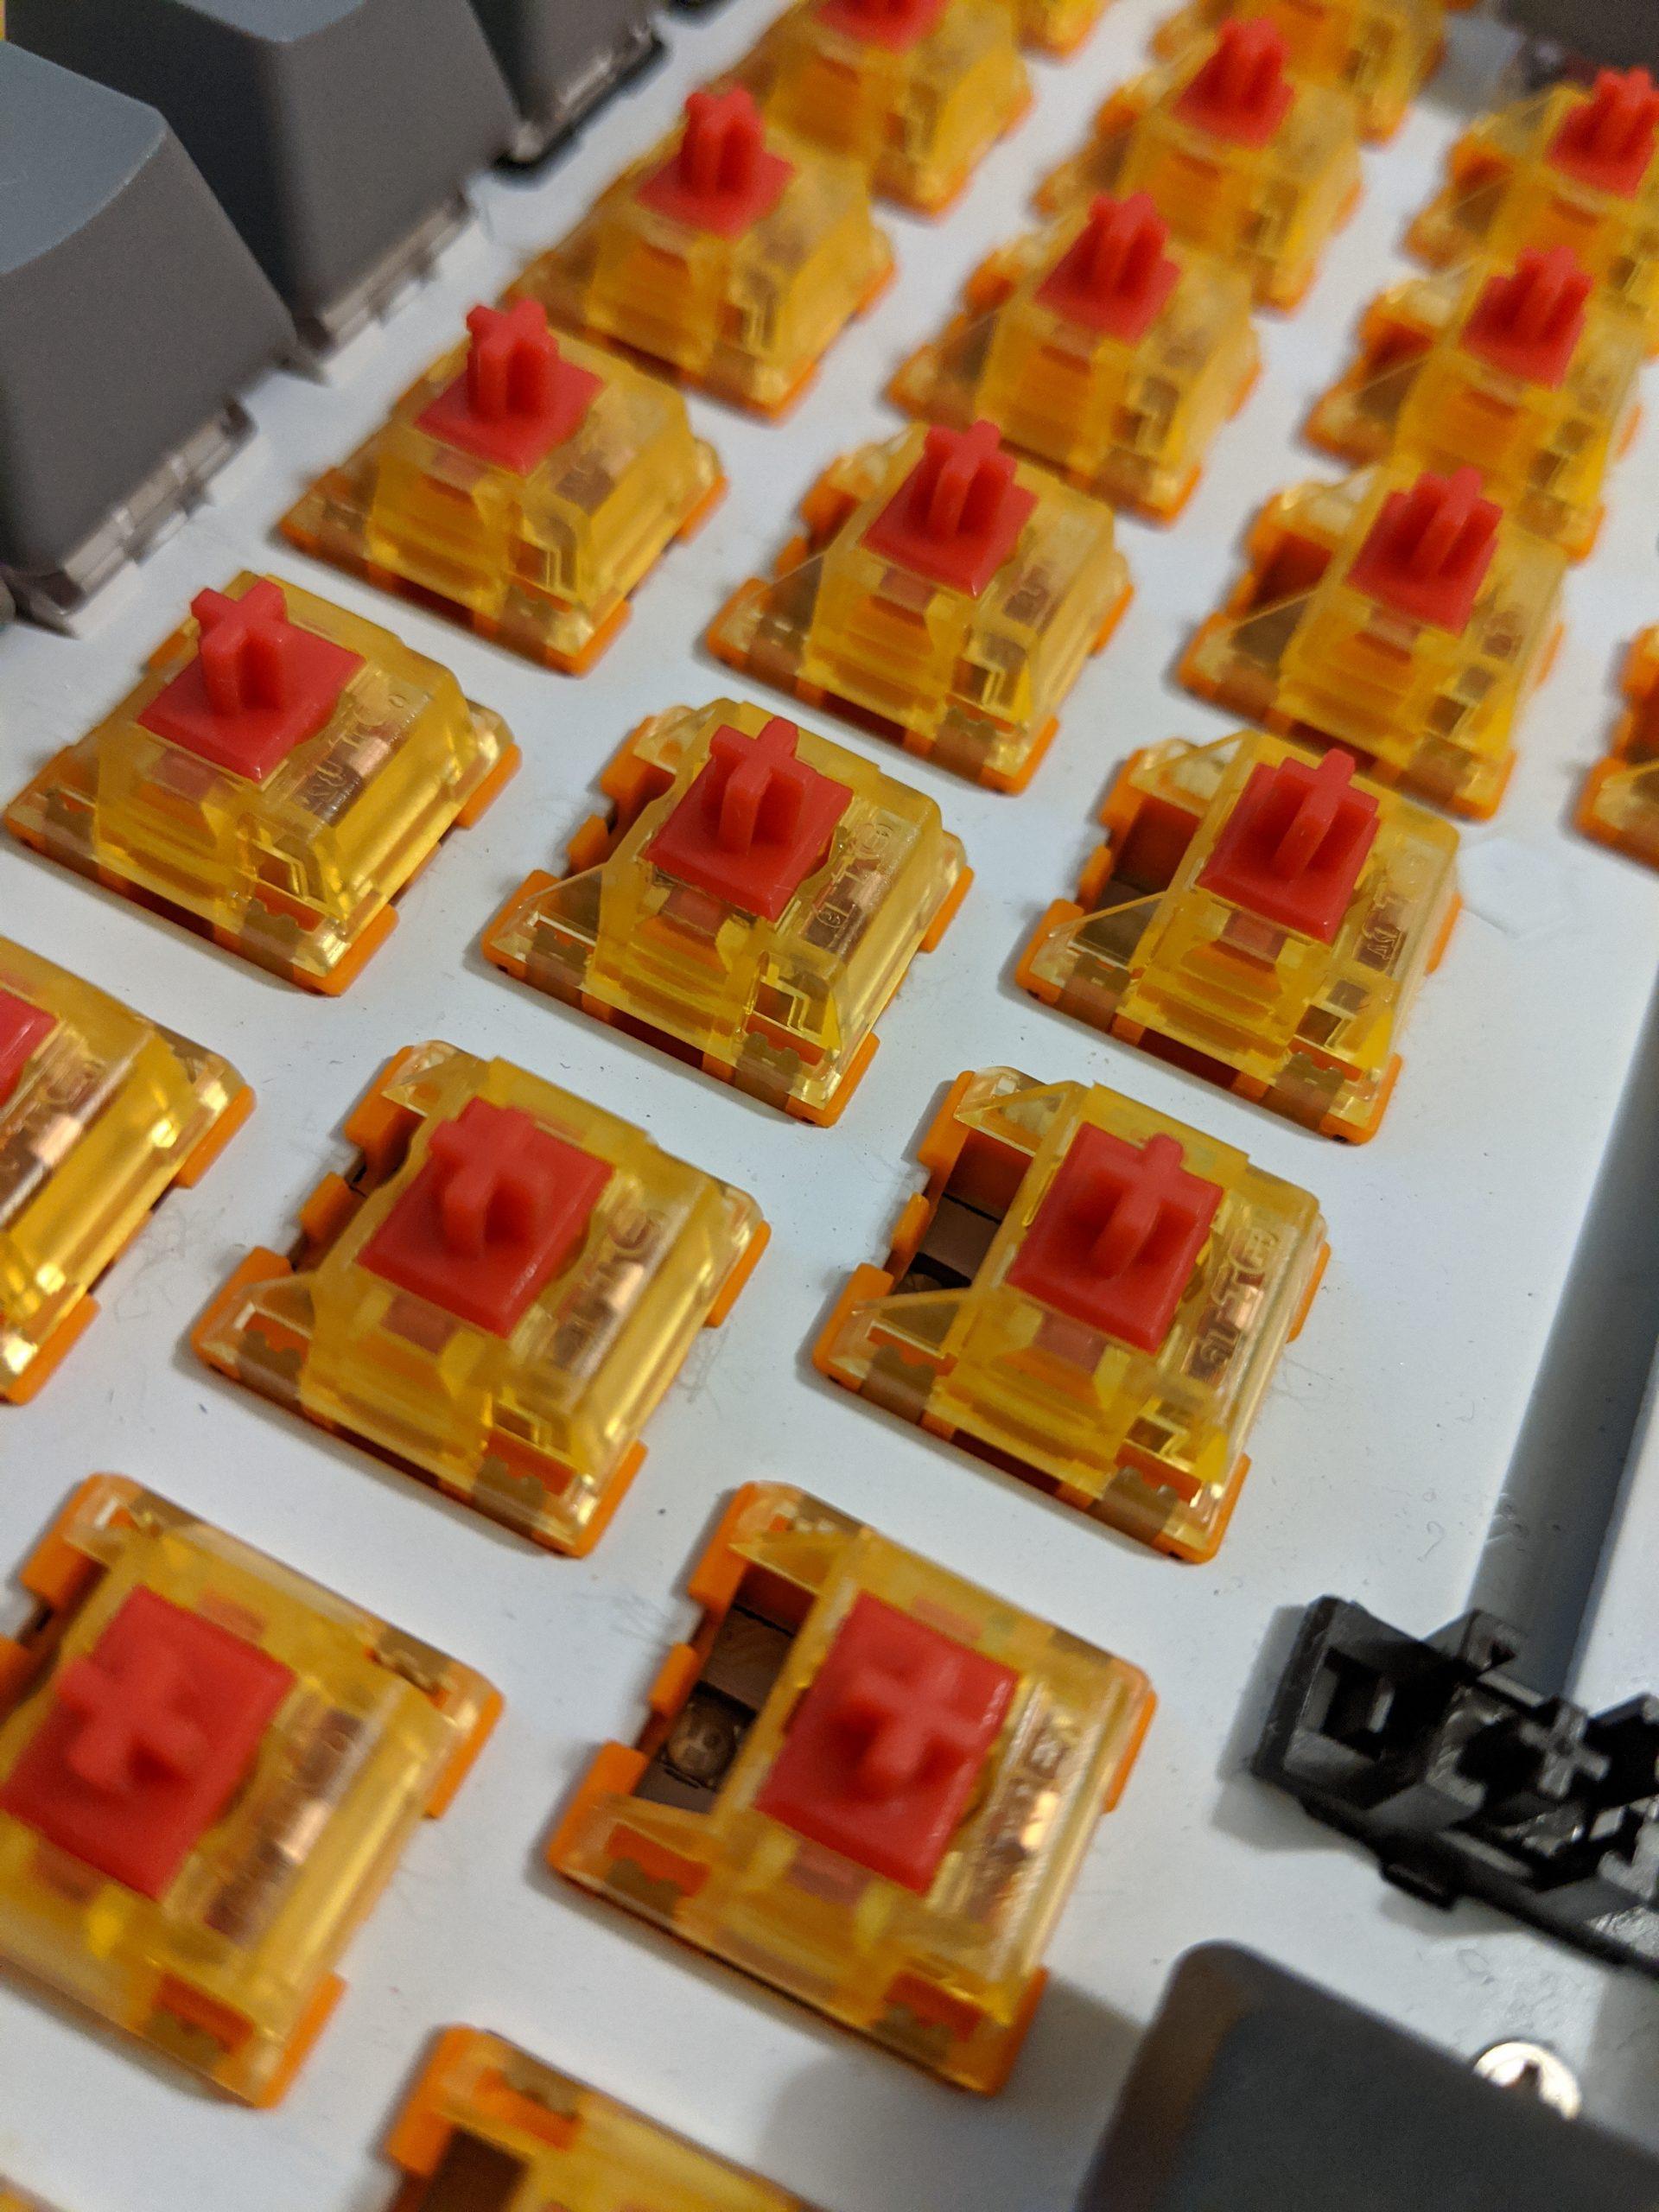 TTC Gold V2 - Red switches.